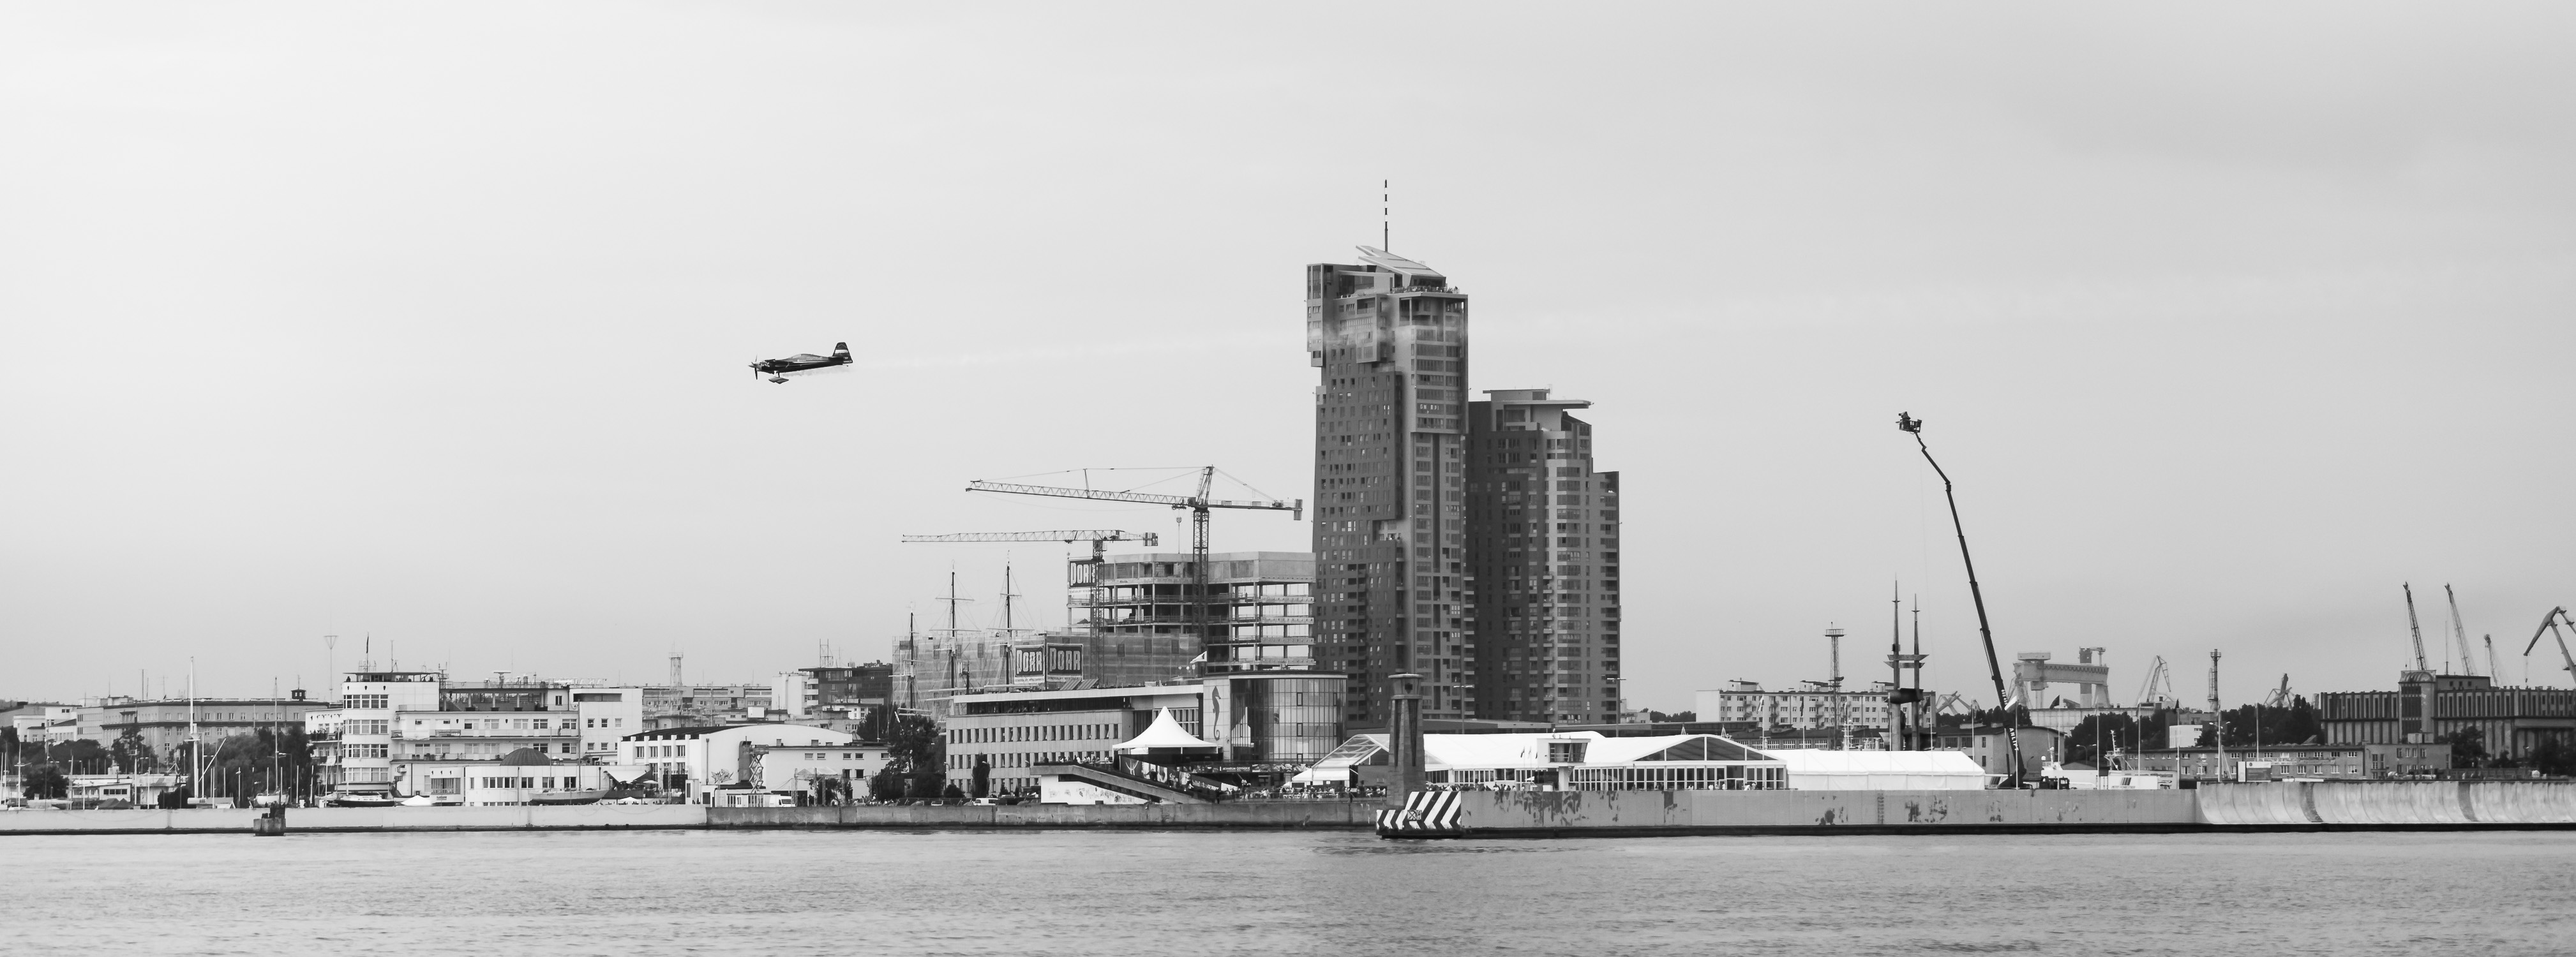 Red Bull Airrace Gdynia 2015